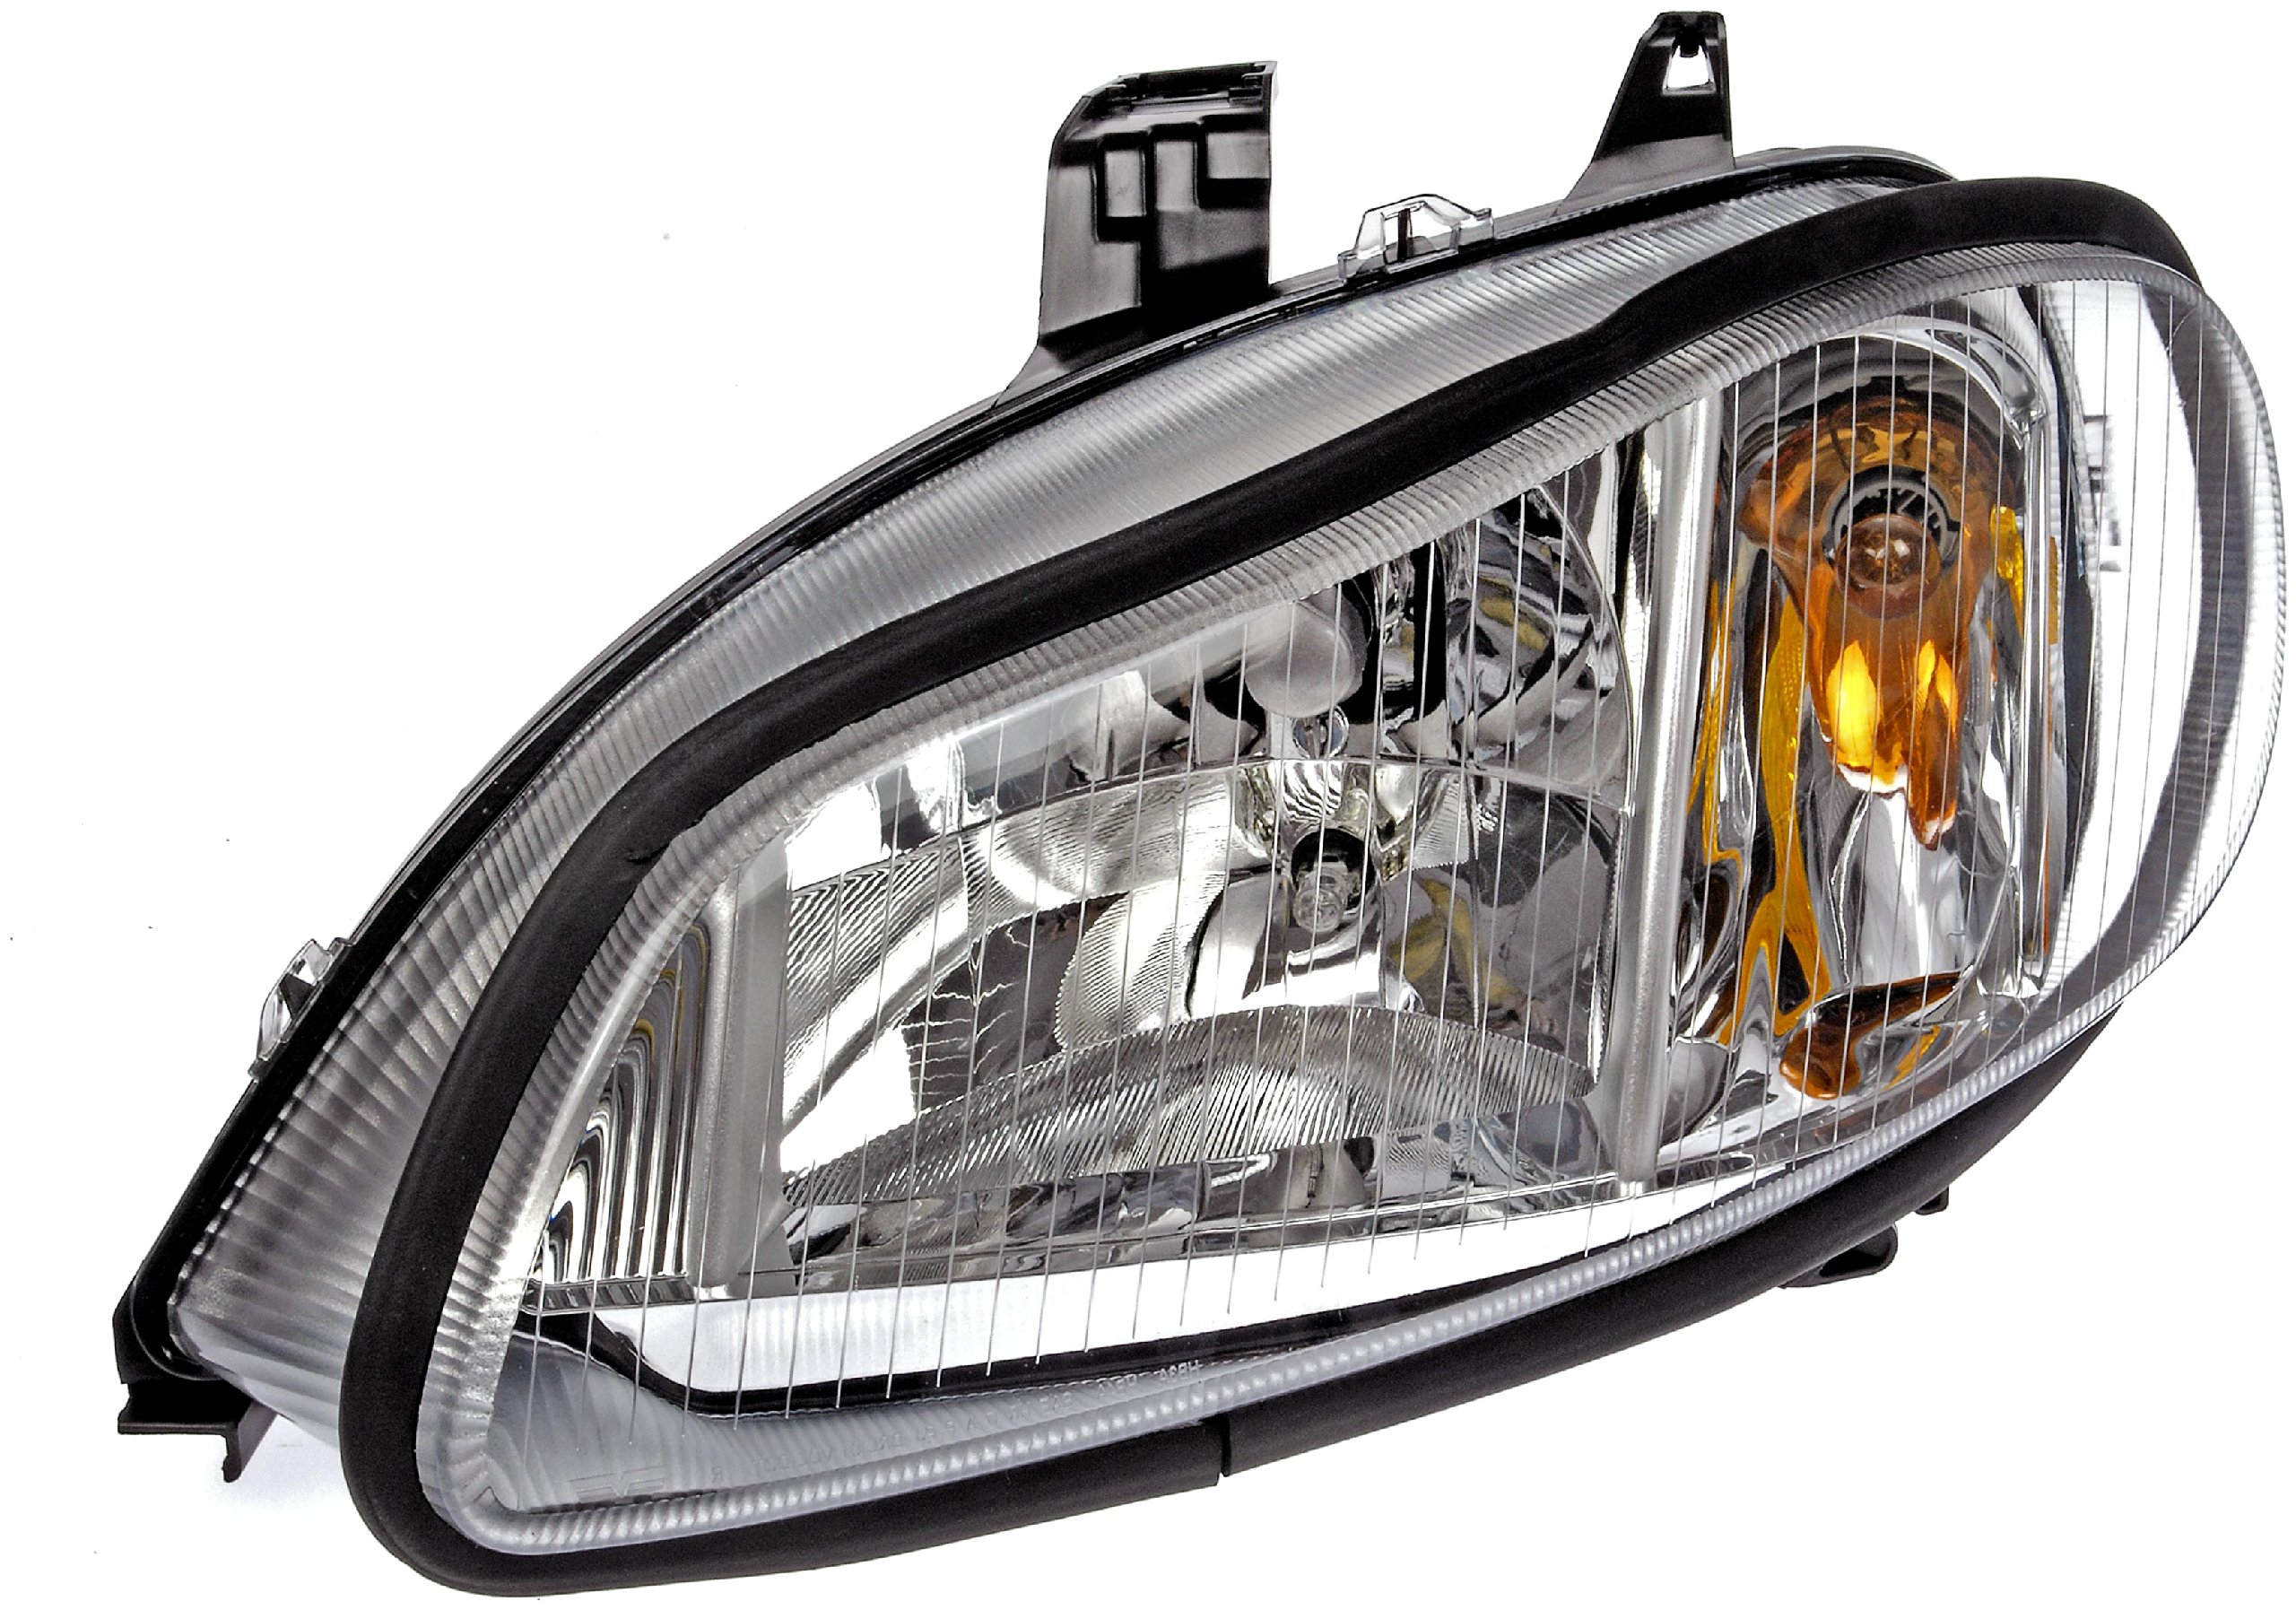 Dorman 888-5204 Driver Side Headlight Assembly For Select Freightliner/Thomas Models